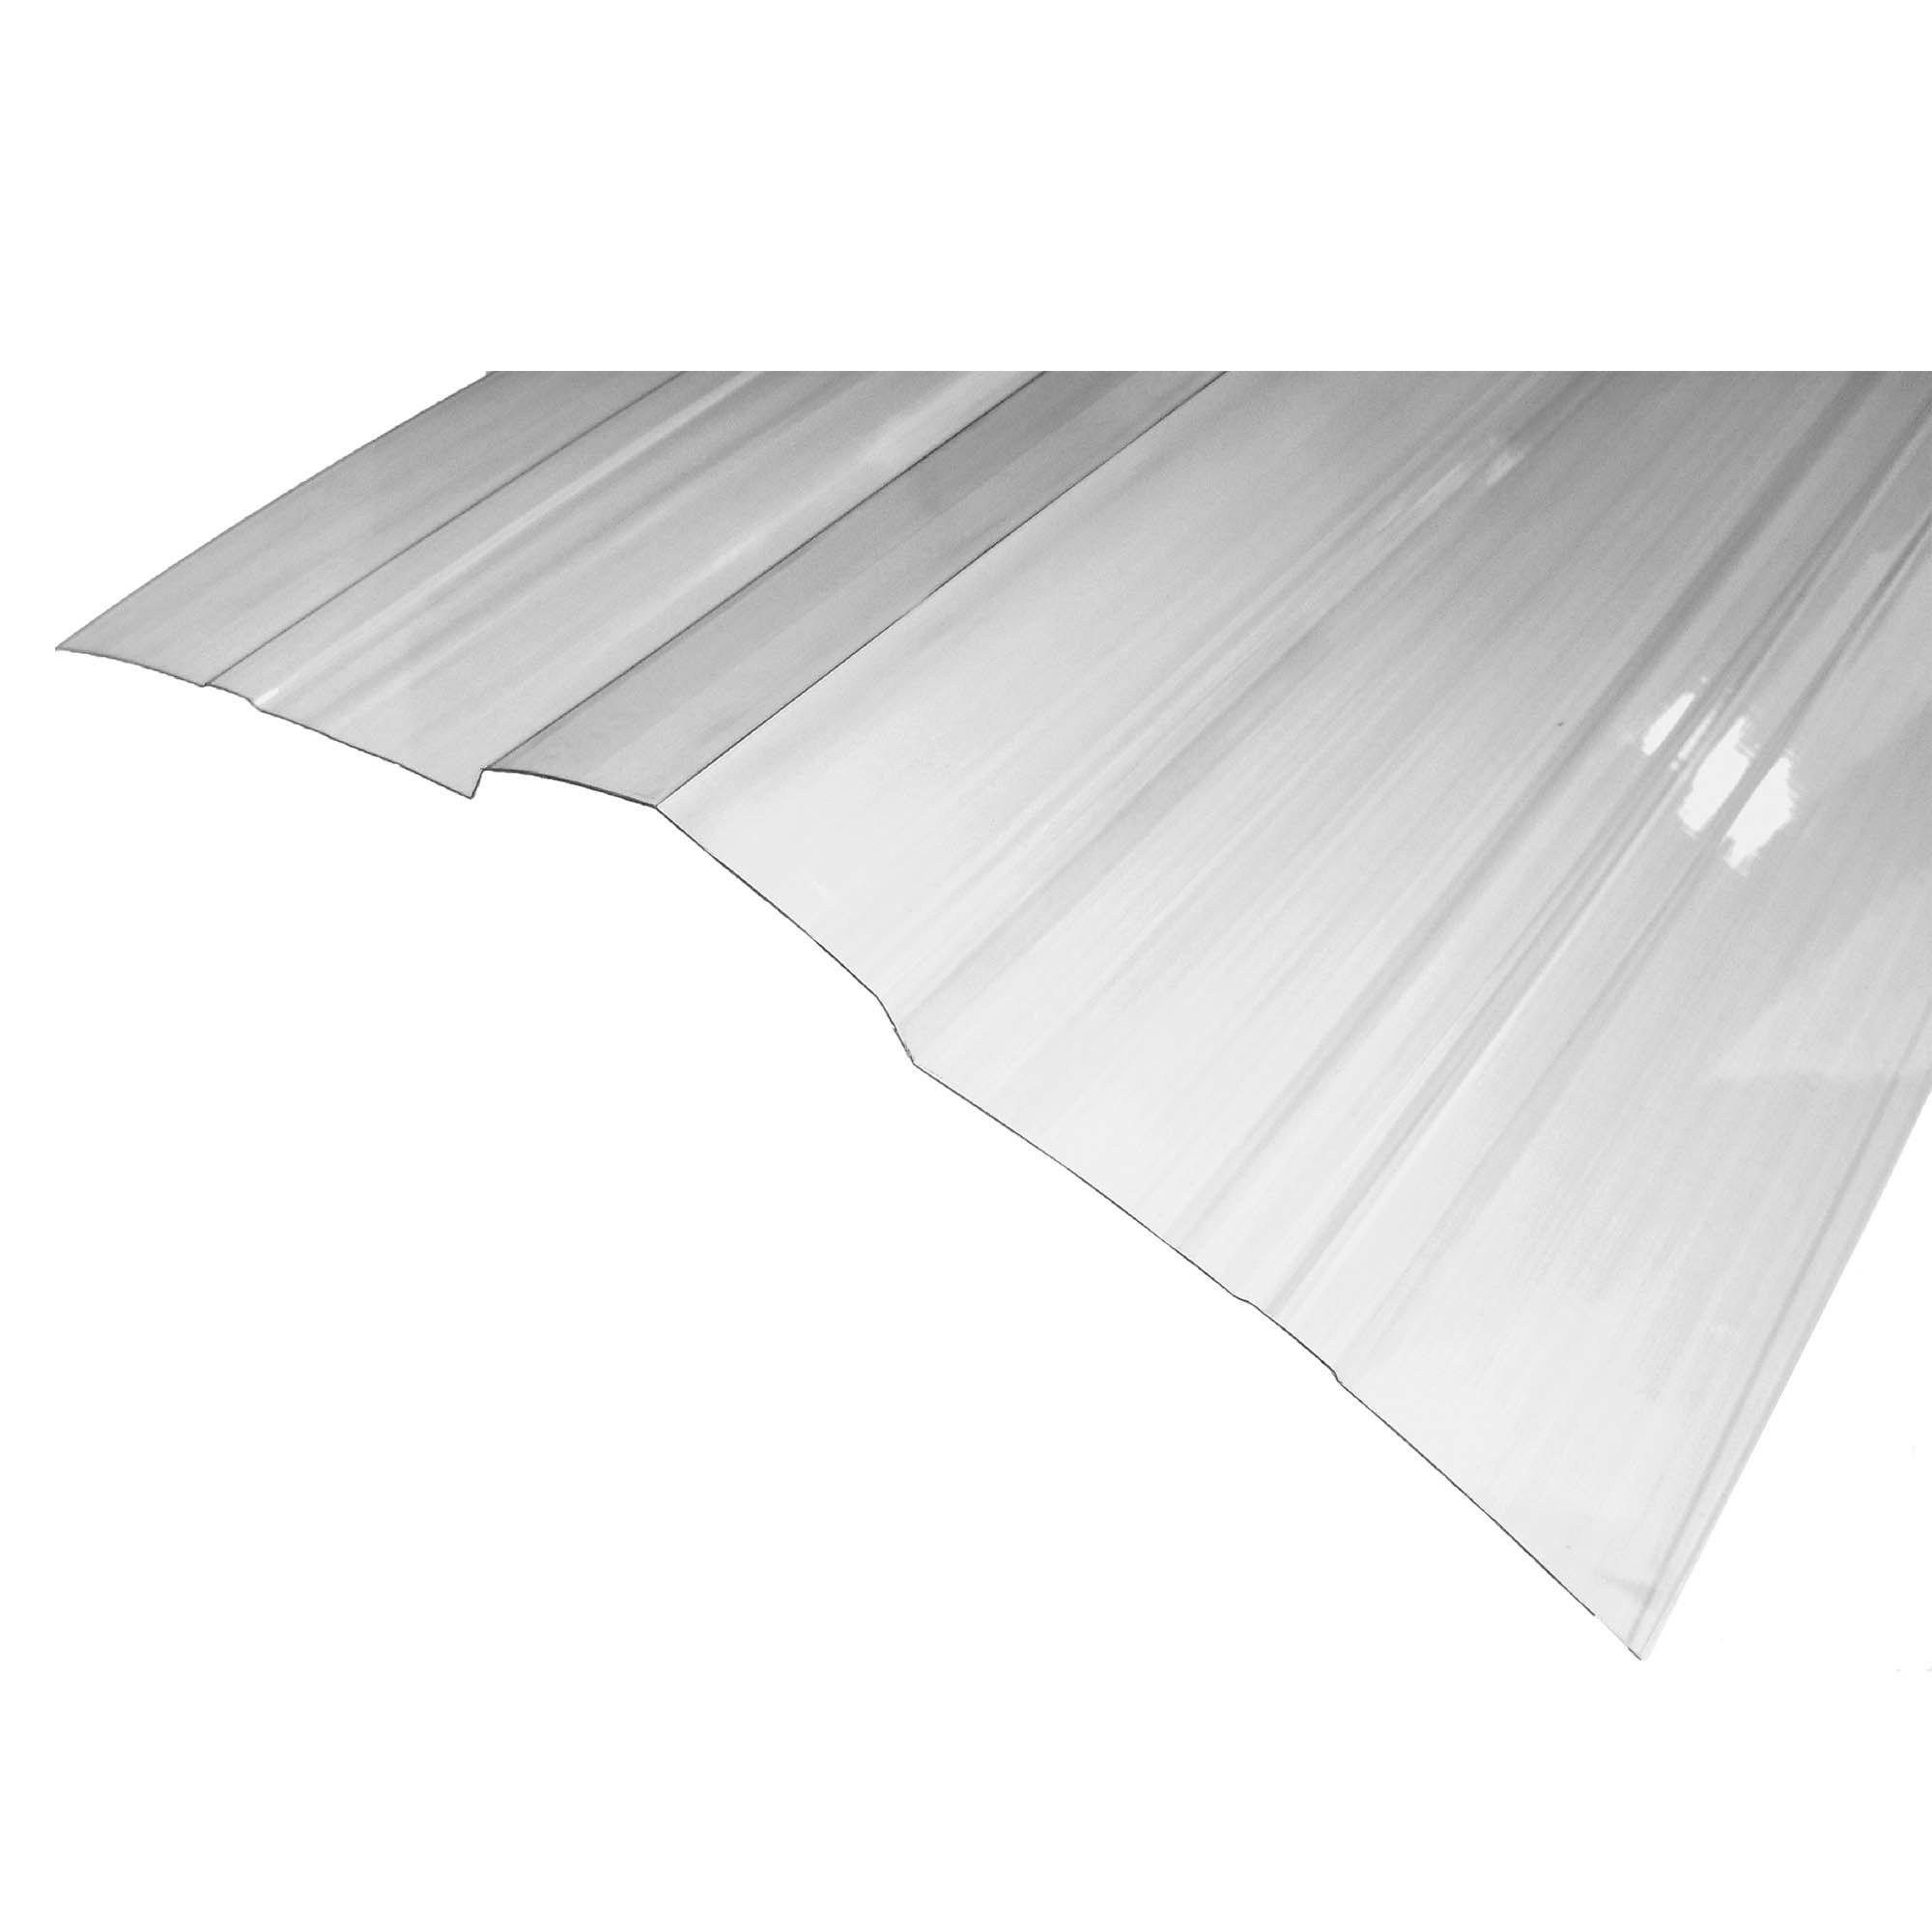 Multiwall Ridge Cap 20 X 51 Roof Panels Kent Building Supplies